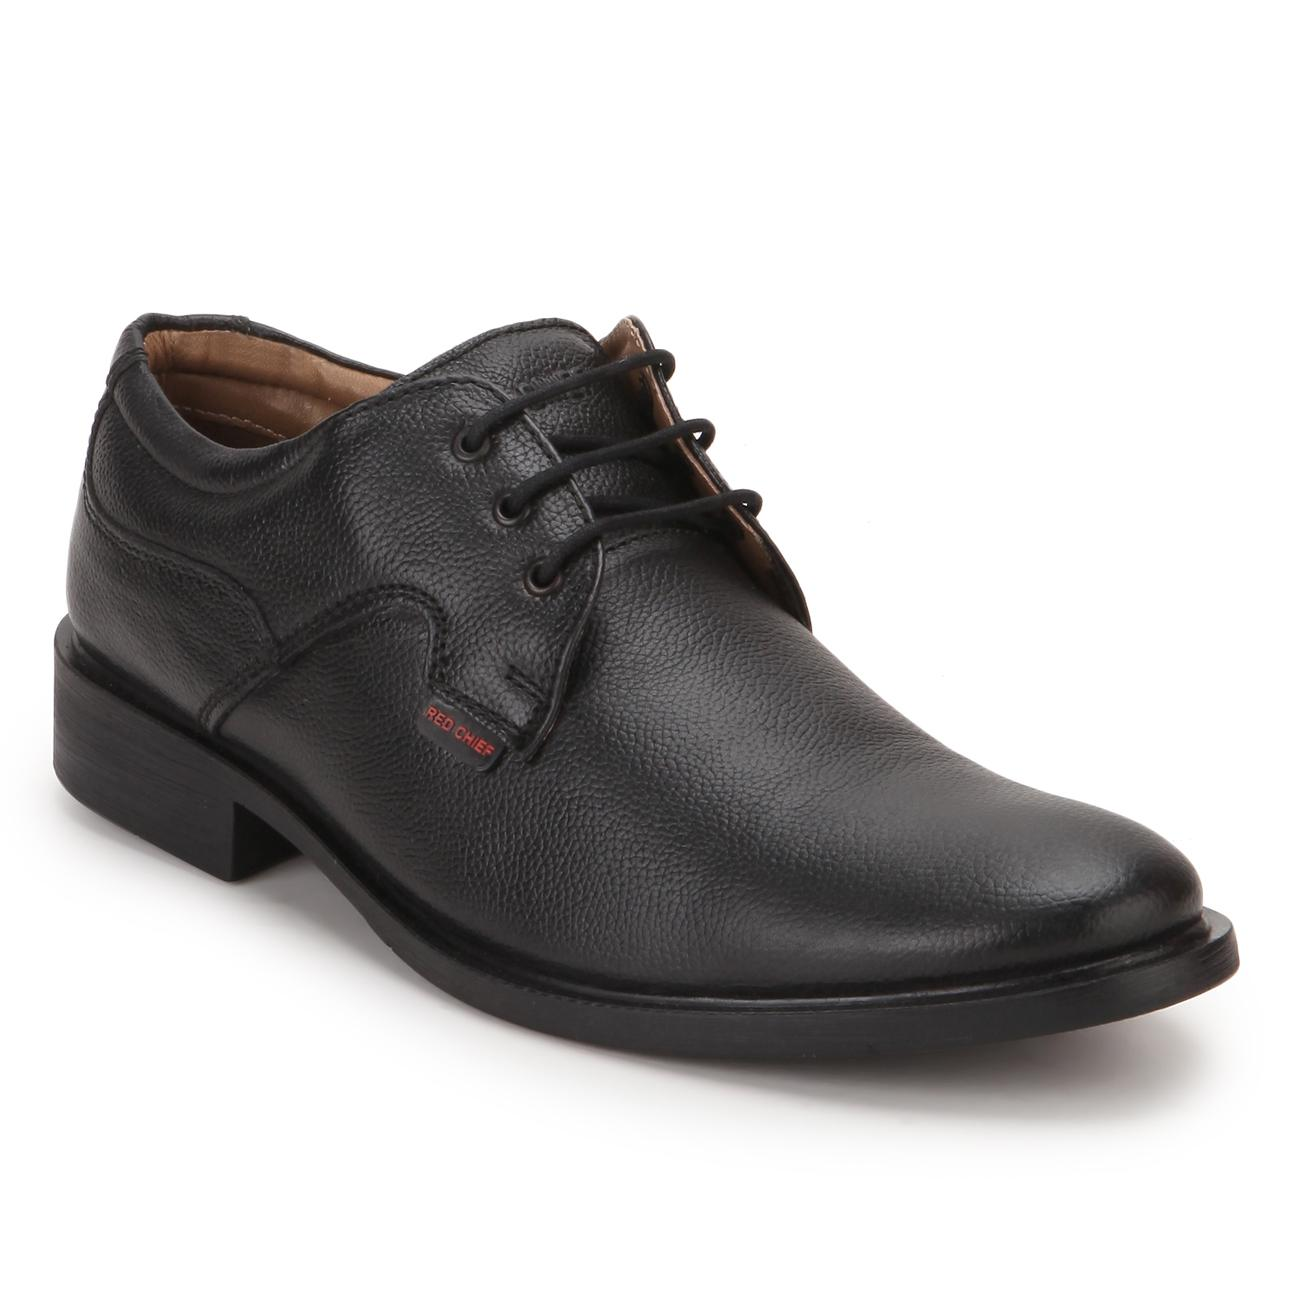 formal leather shoes for men�s buy footwear online sale